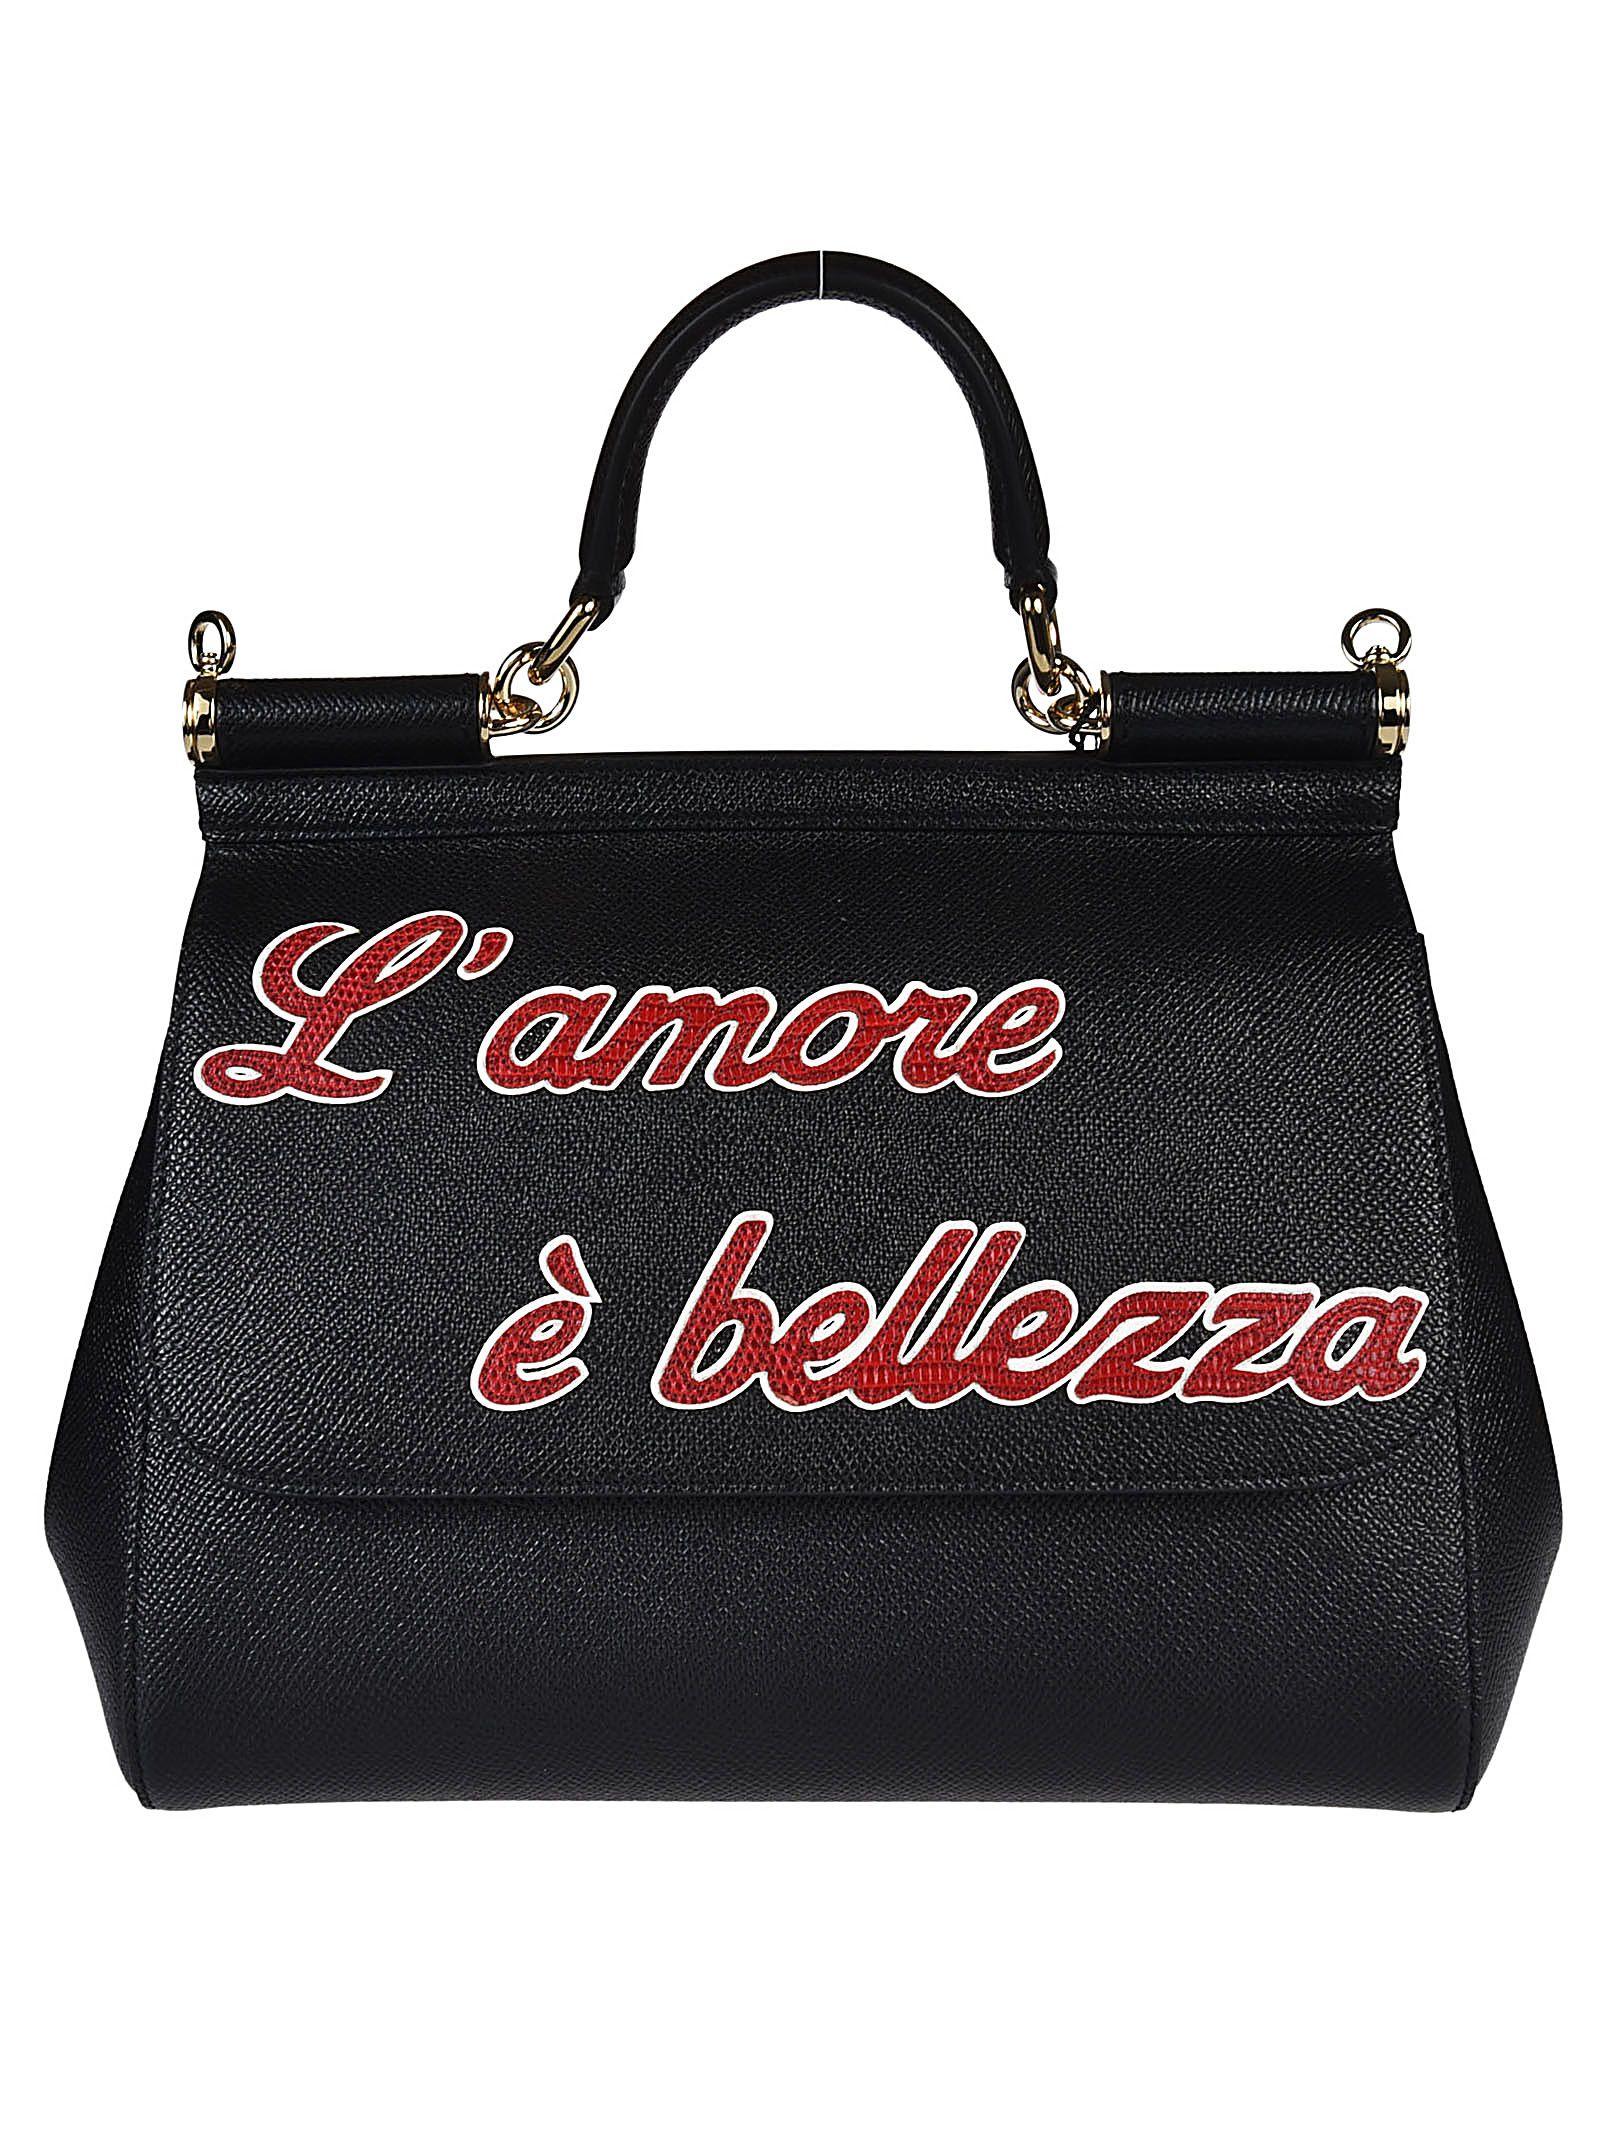 Dolce & Gabbana Lamore Sicily Tote